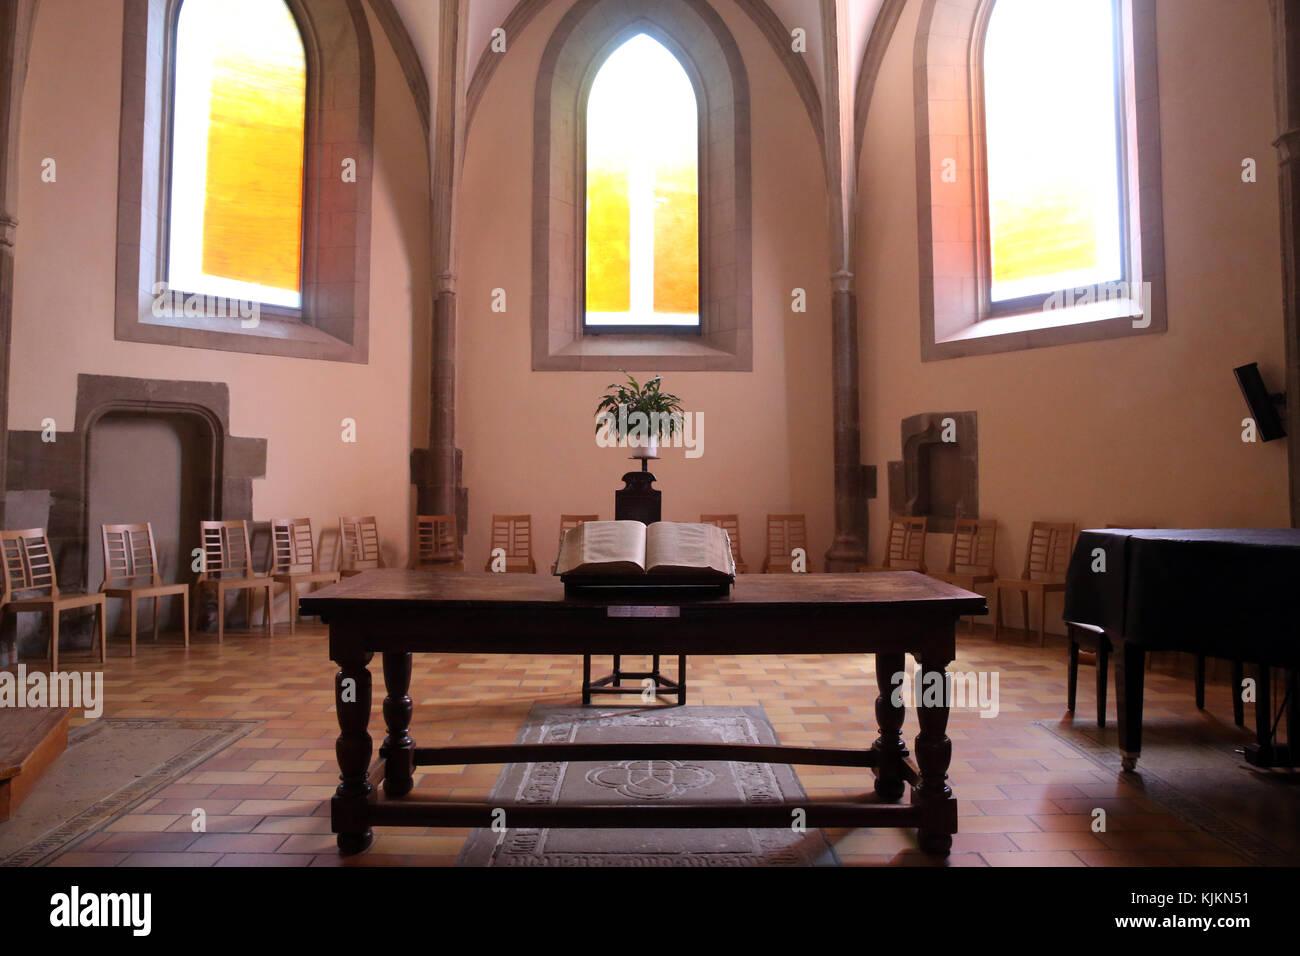 Calvin Auditory. Bible on the altar.  Geneva. Switzerland. - Stock Image